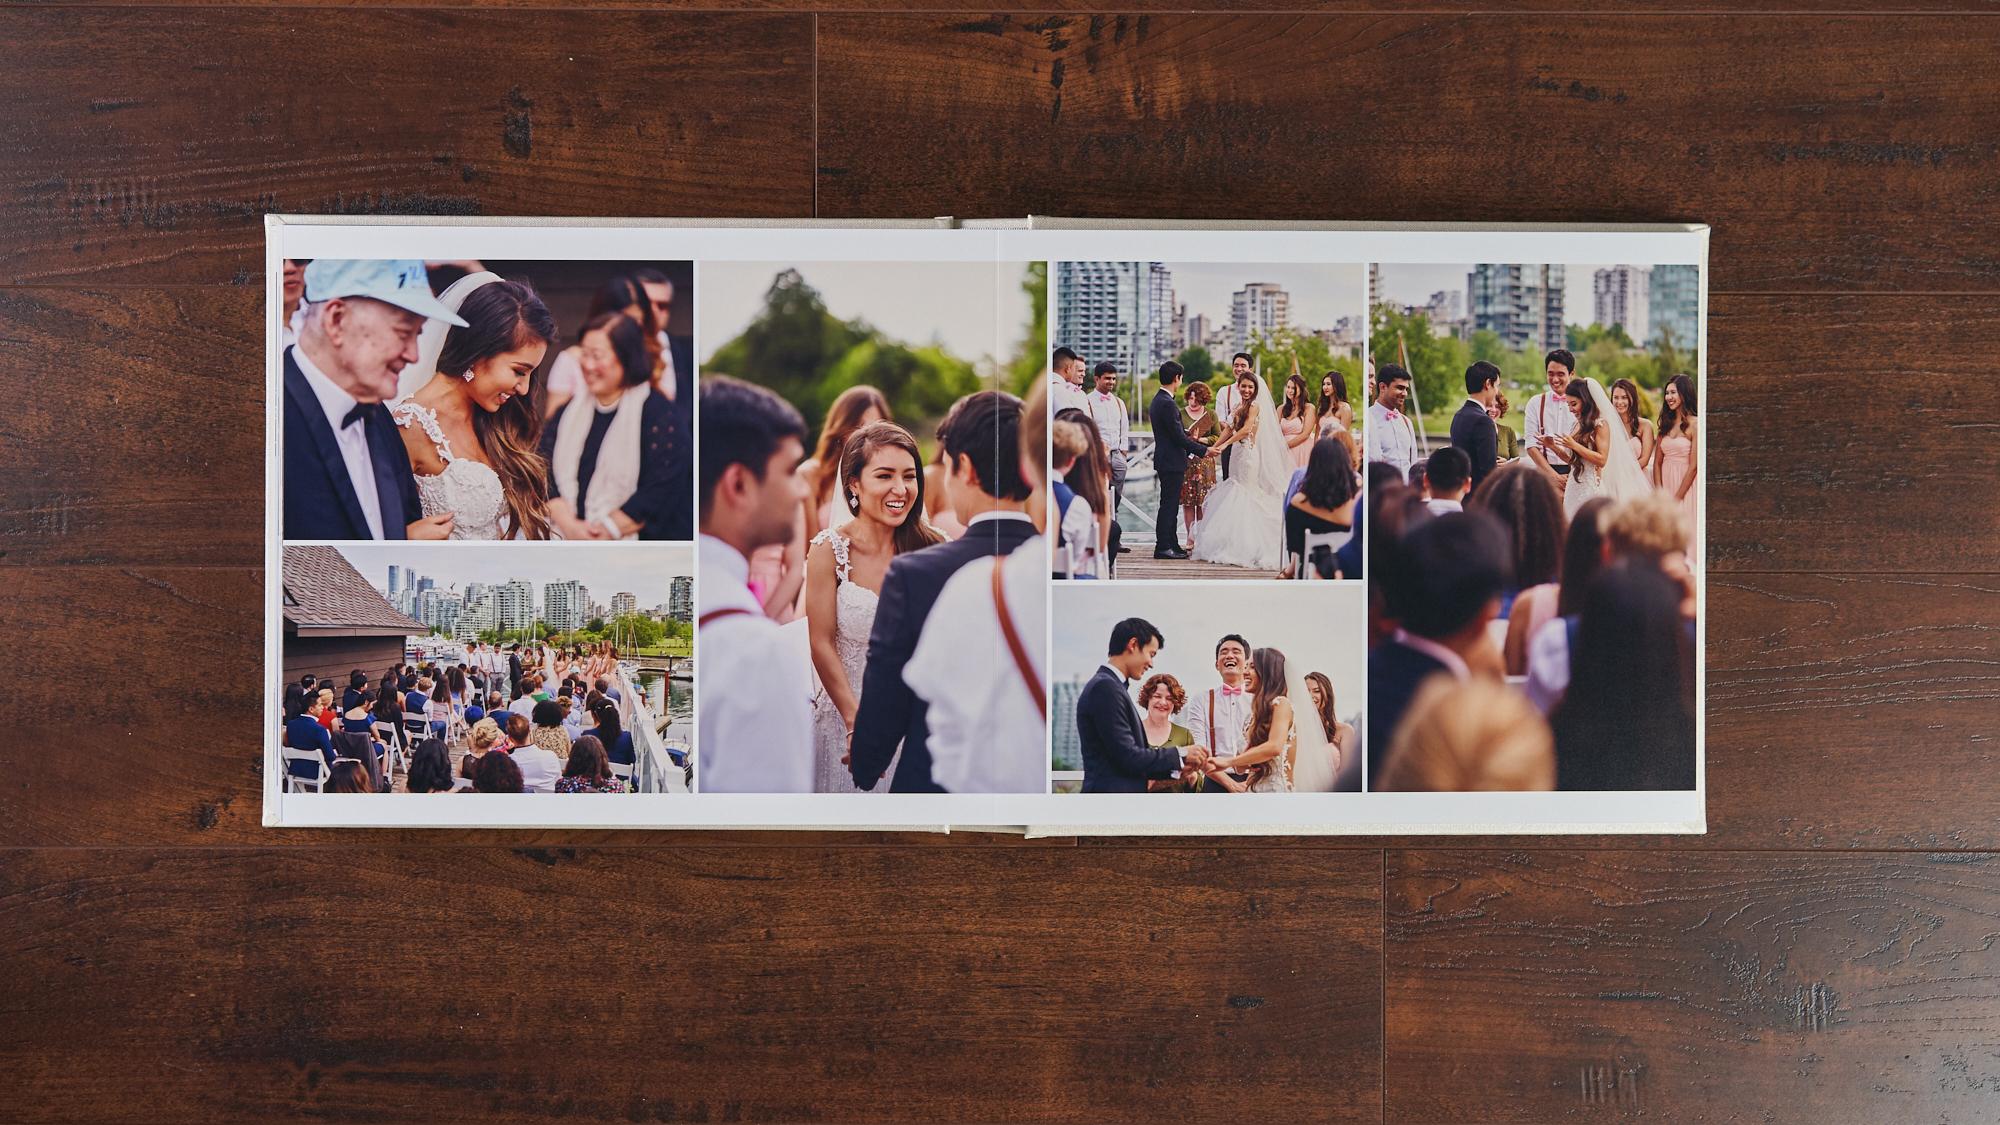 Anita & JC Wedding Album 0019.jpg